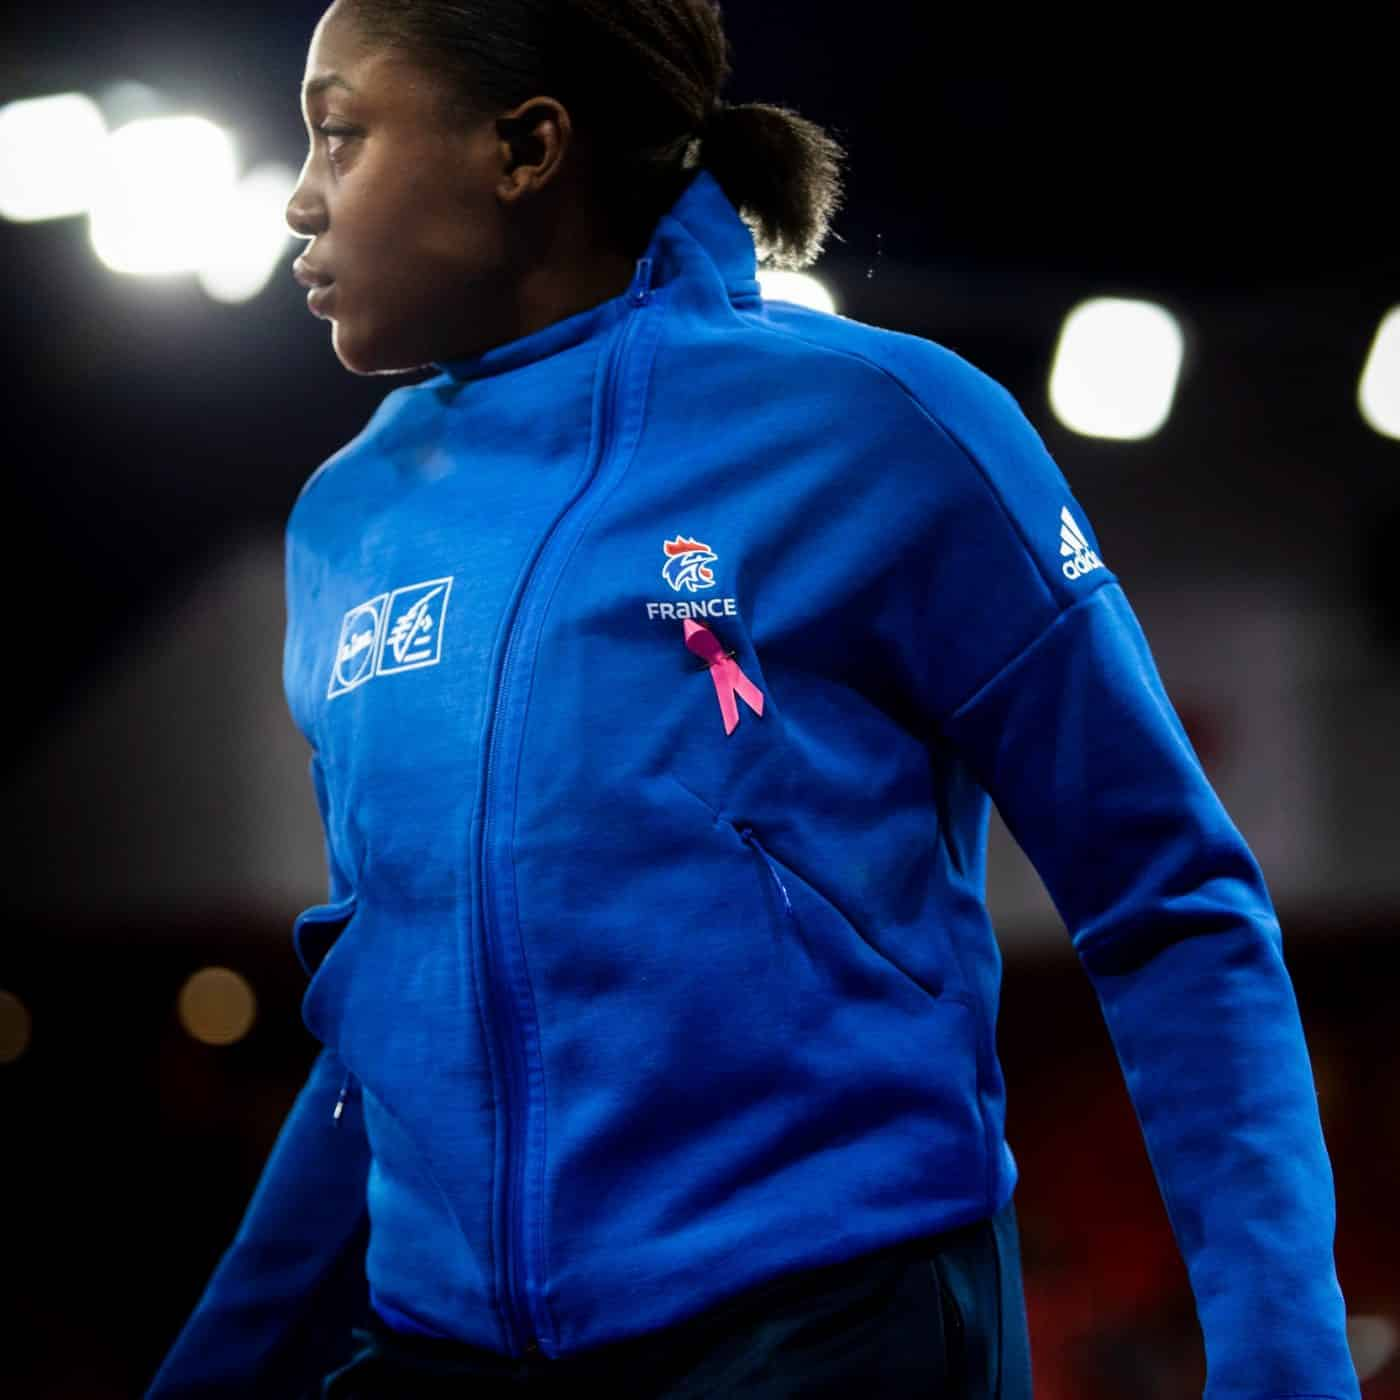 octobre-rose-équipe-de-france-handball-2019-caisse-d-epargne-6